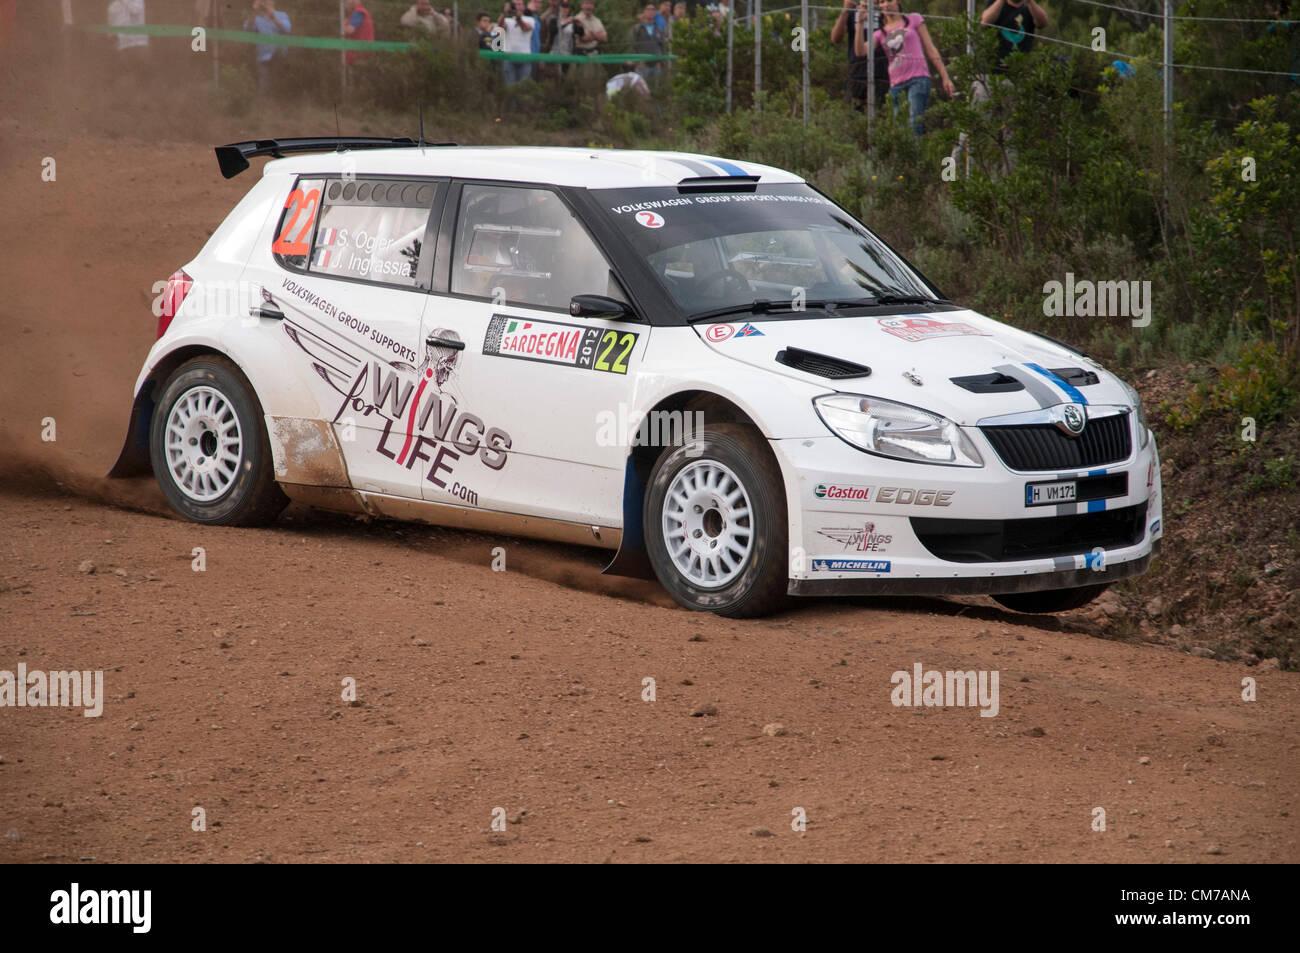 21.10.2012. Olbia, Italy Rally Italia Sardegna 2012,  italian stage of World Rally Championship. Day 4. Special - Stock Image